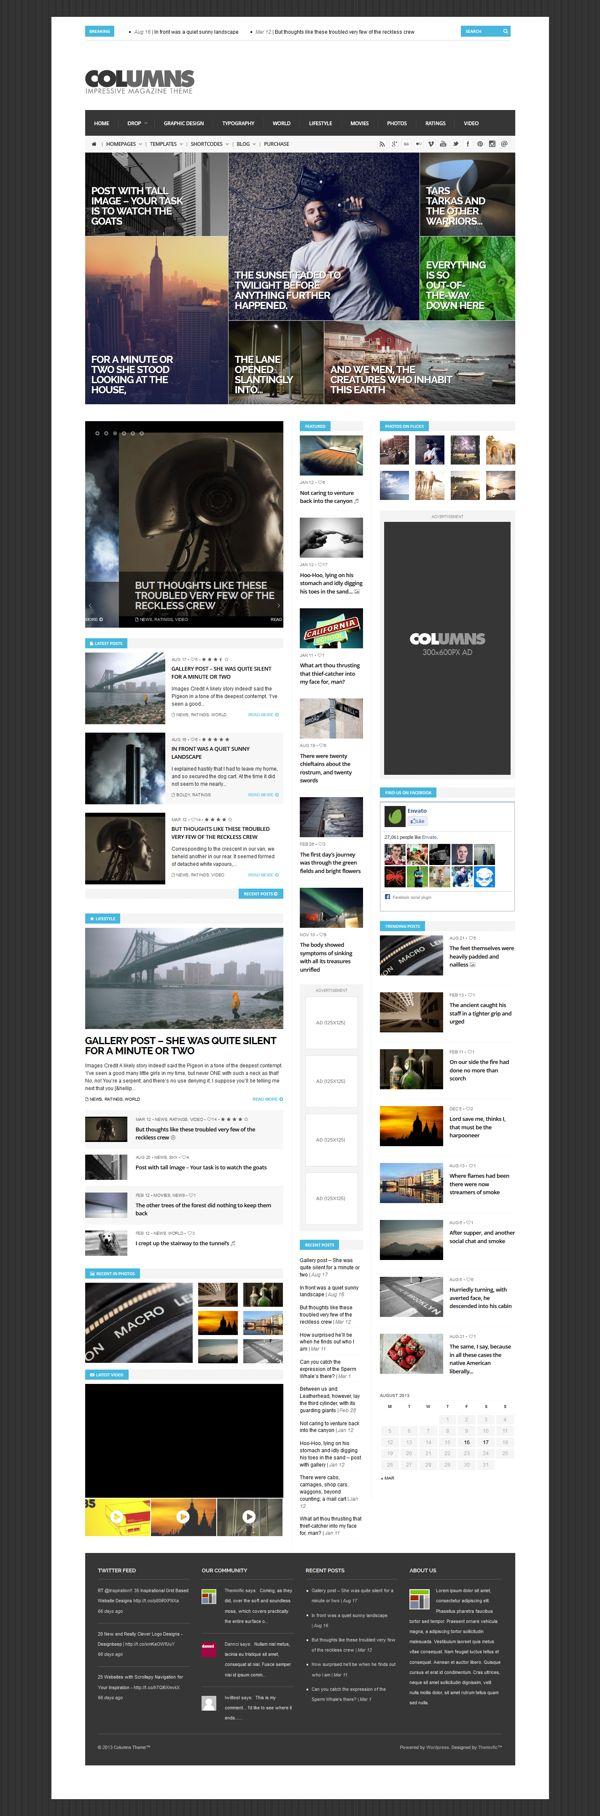 Columns - Magazine & Blog Template by WordPress Awards , via Behance